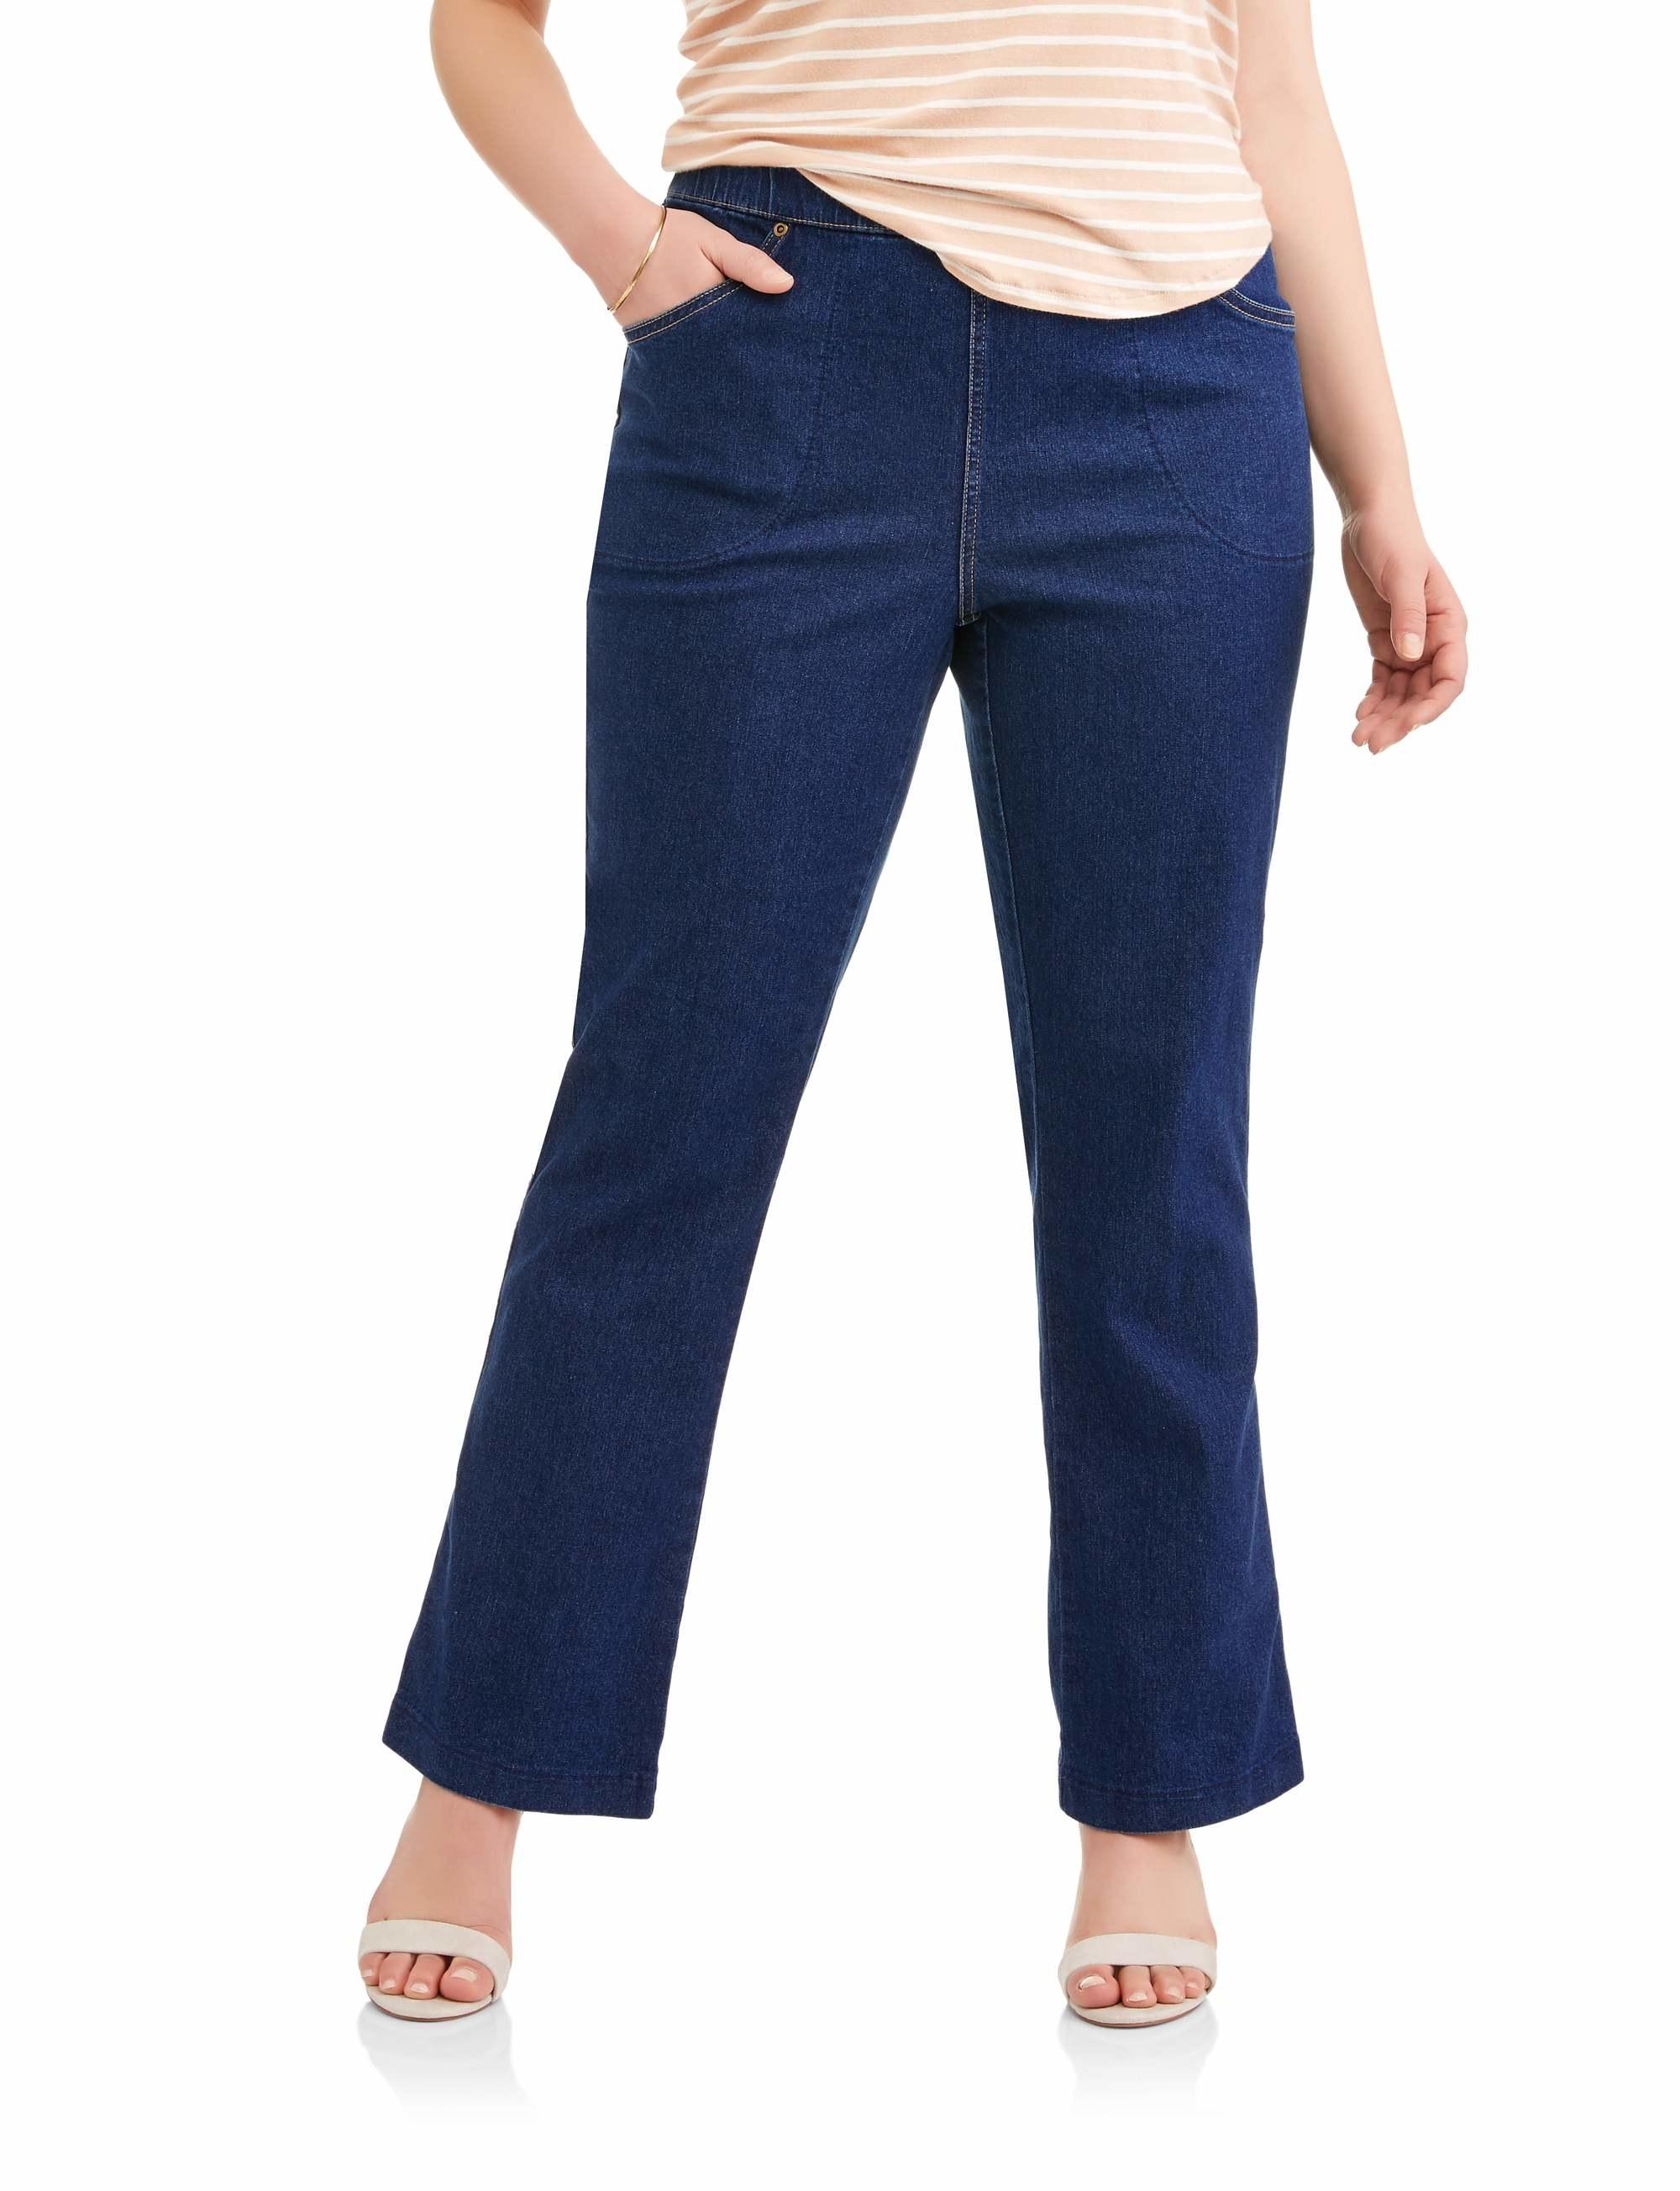 model in dark blue bootcut denim jeans